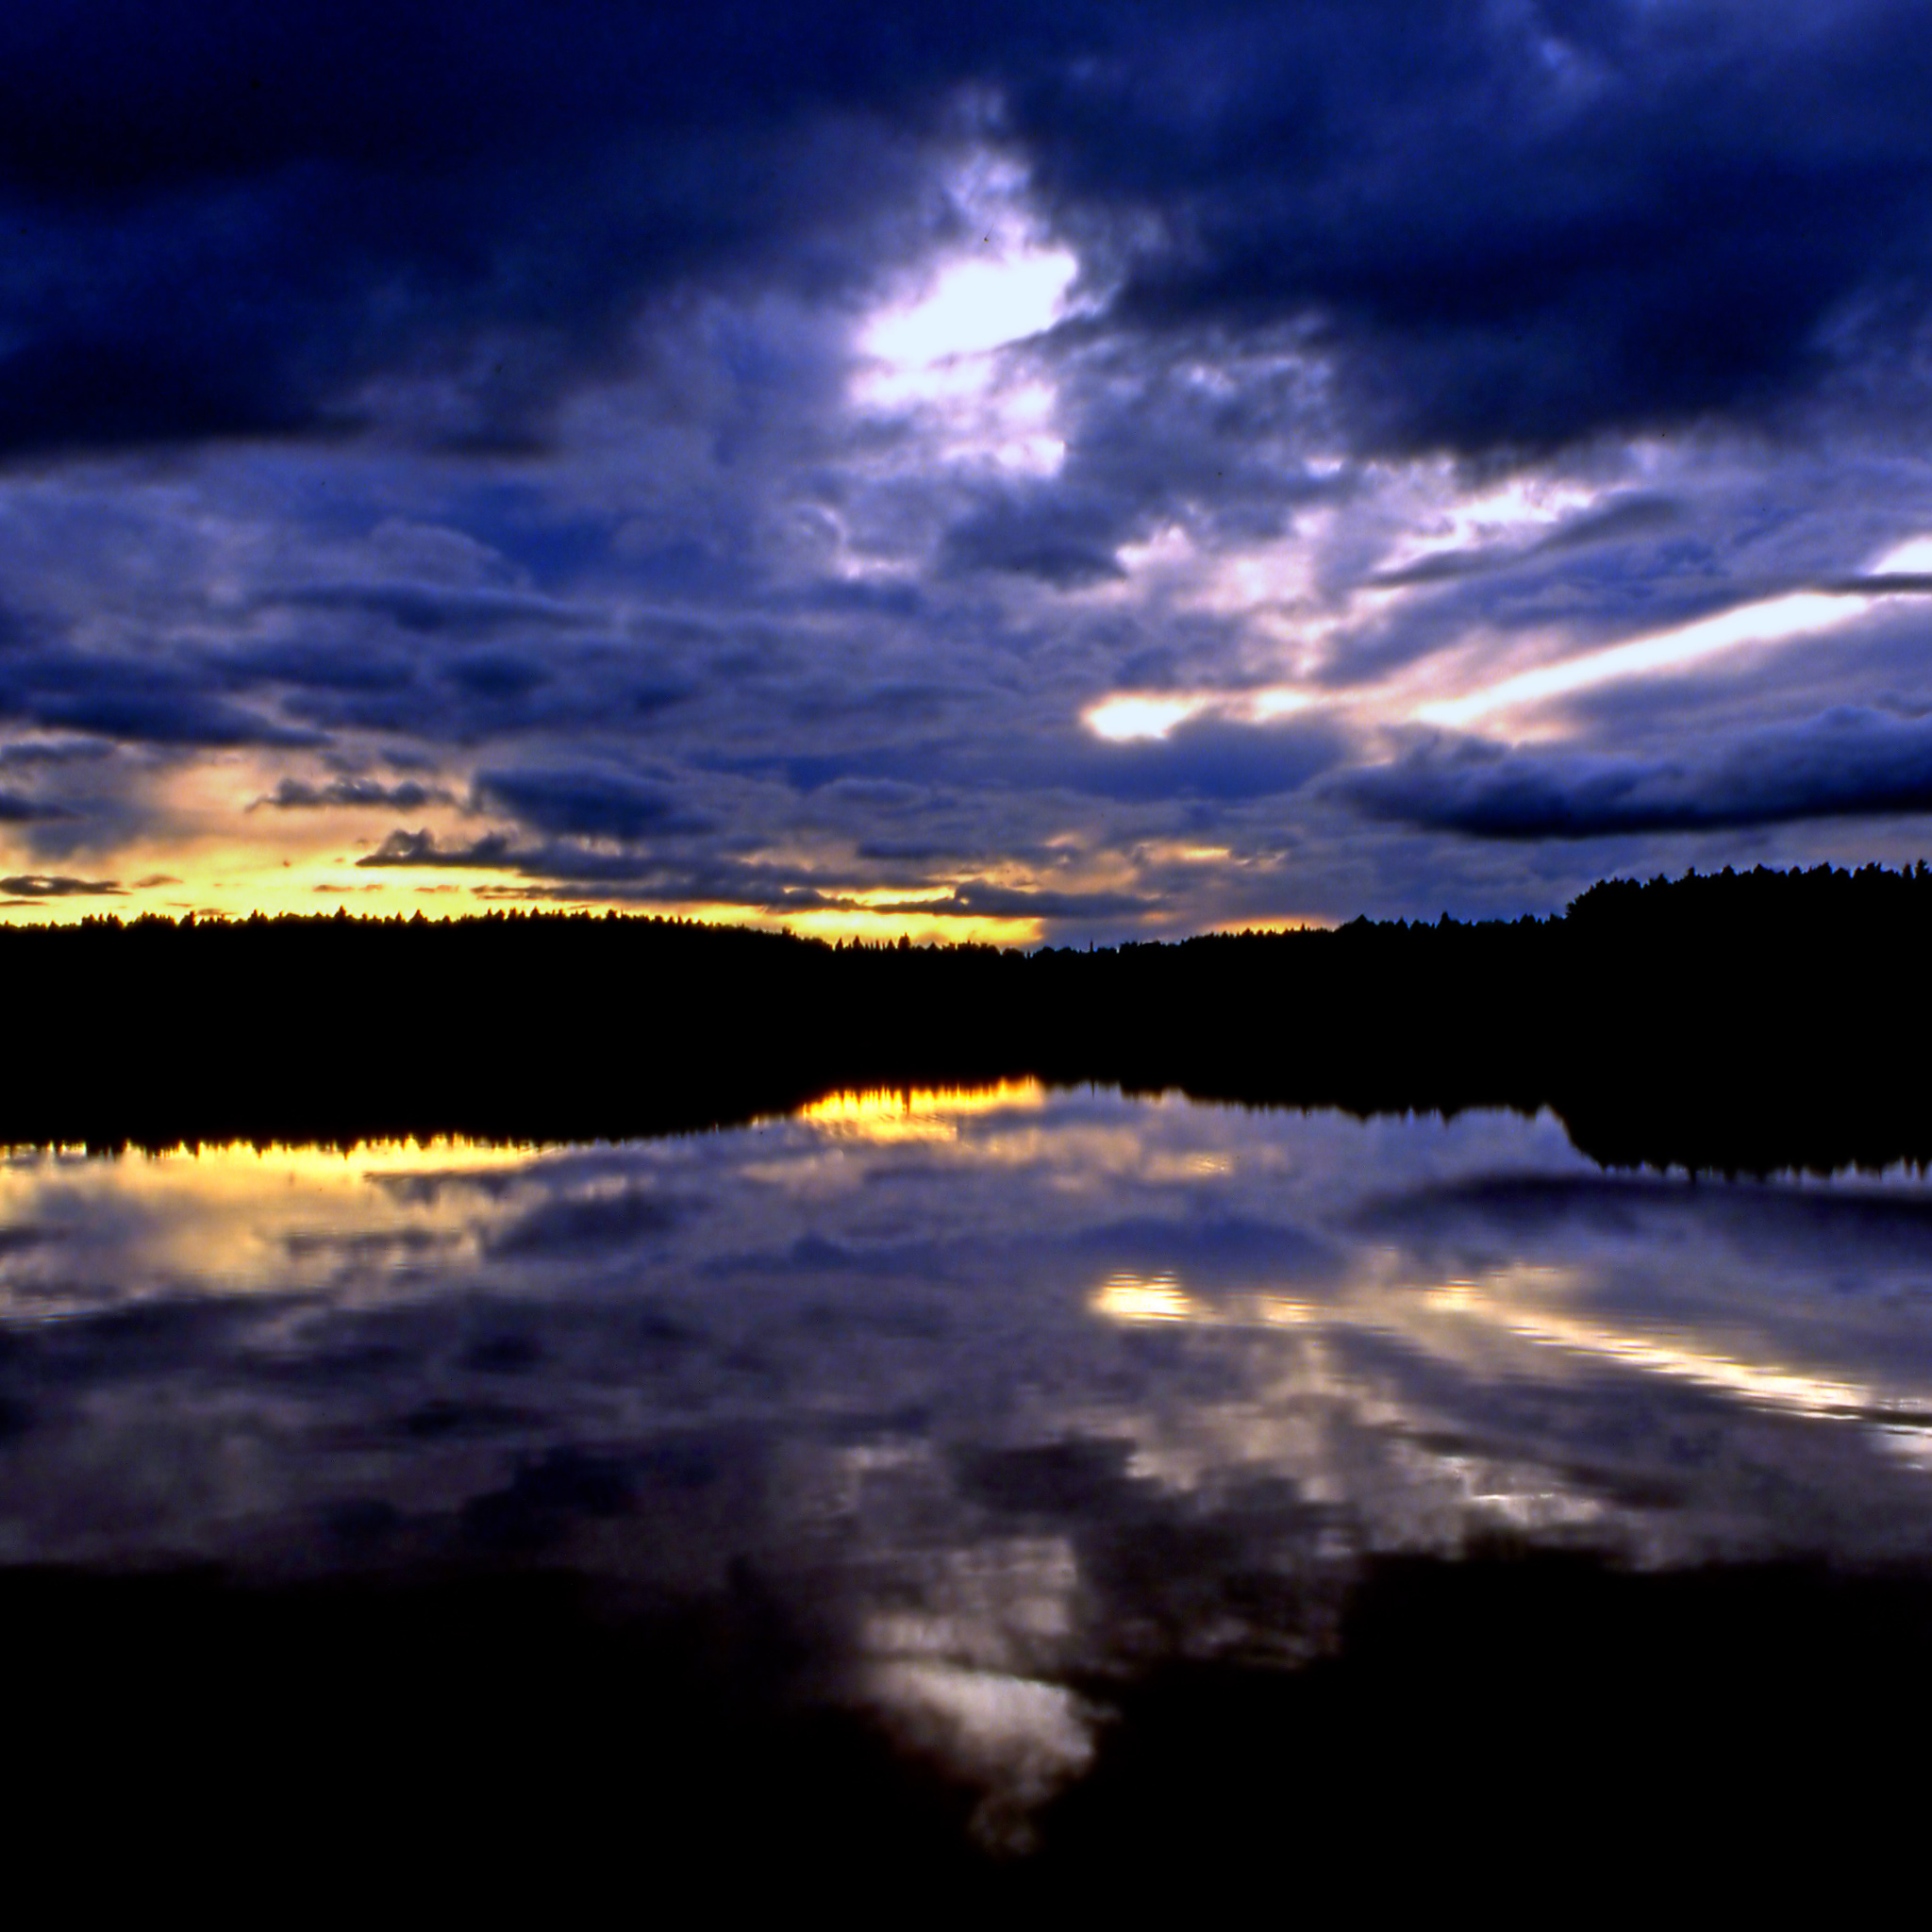 steve took it - sunset lake ipad wallpaper